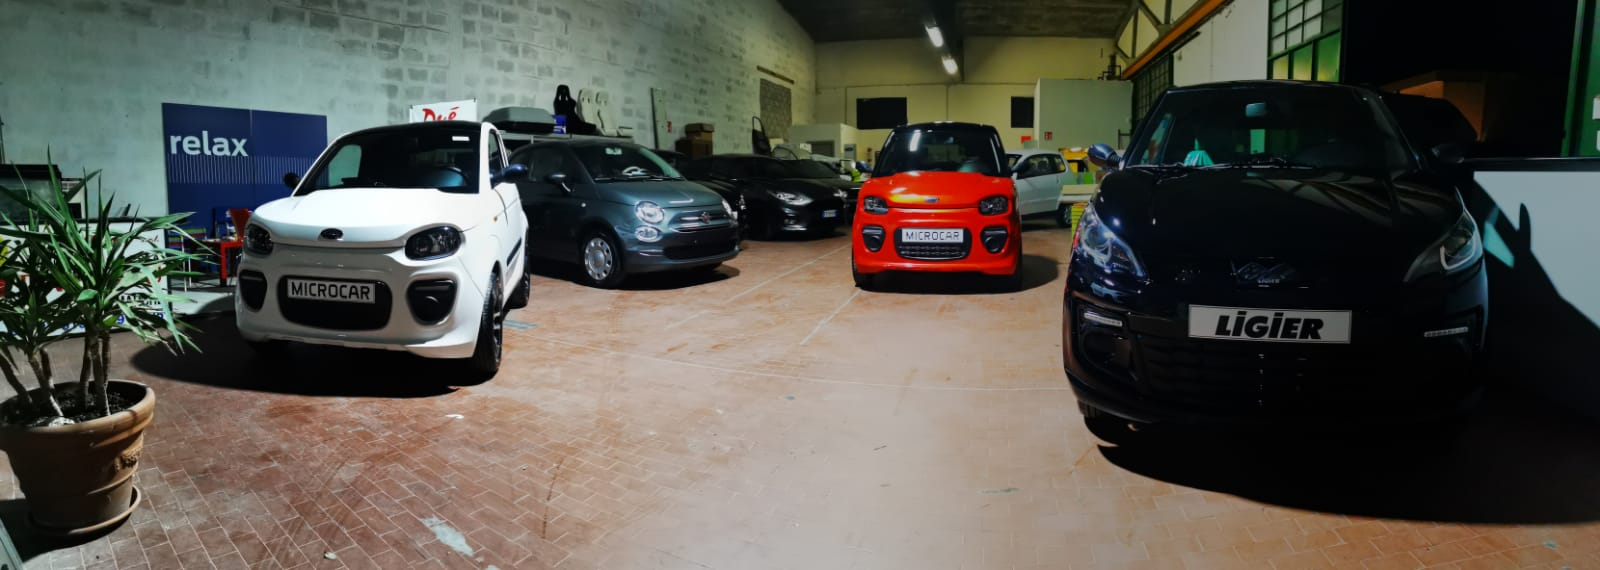 Vendita e noleggio minicar Interauto